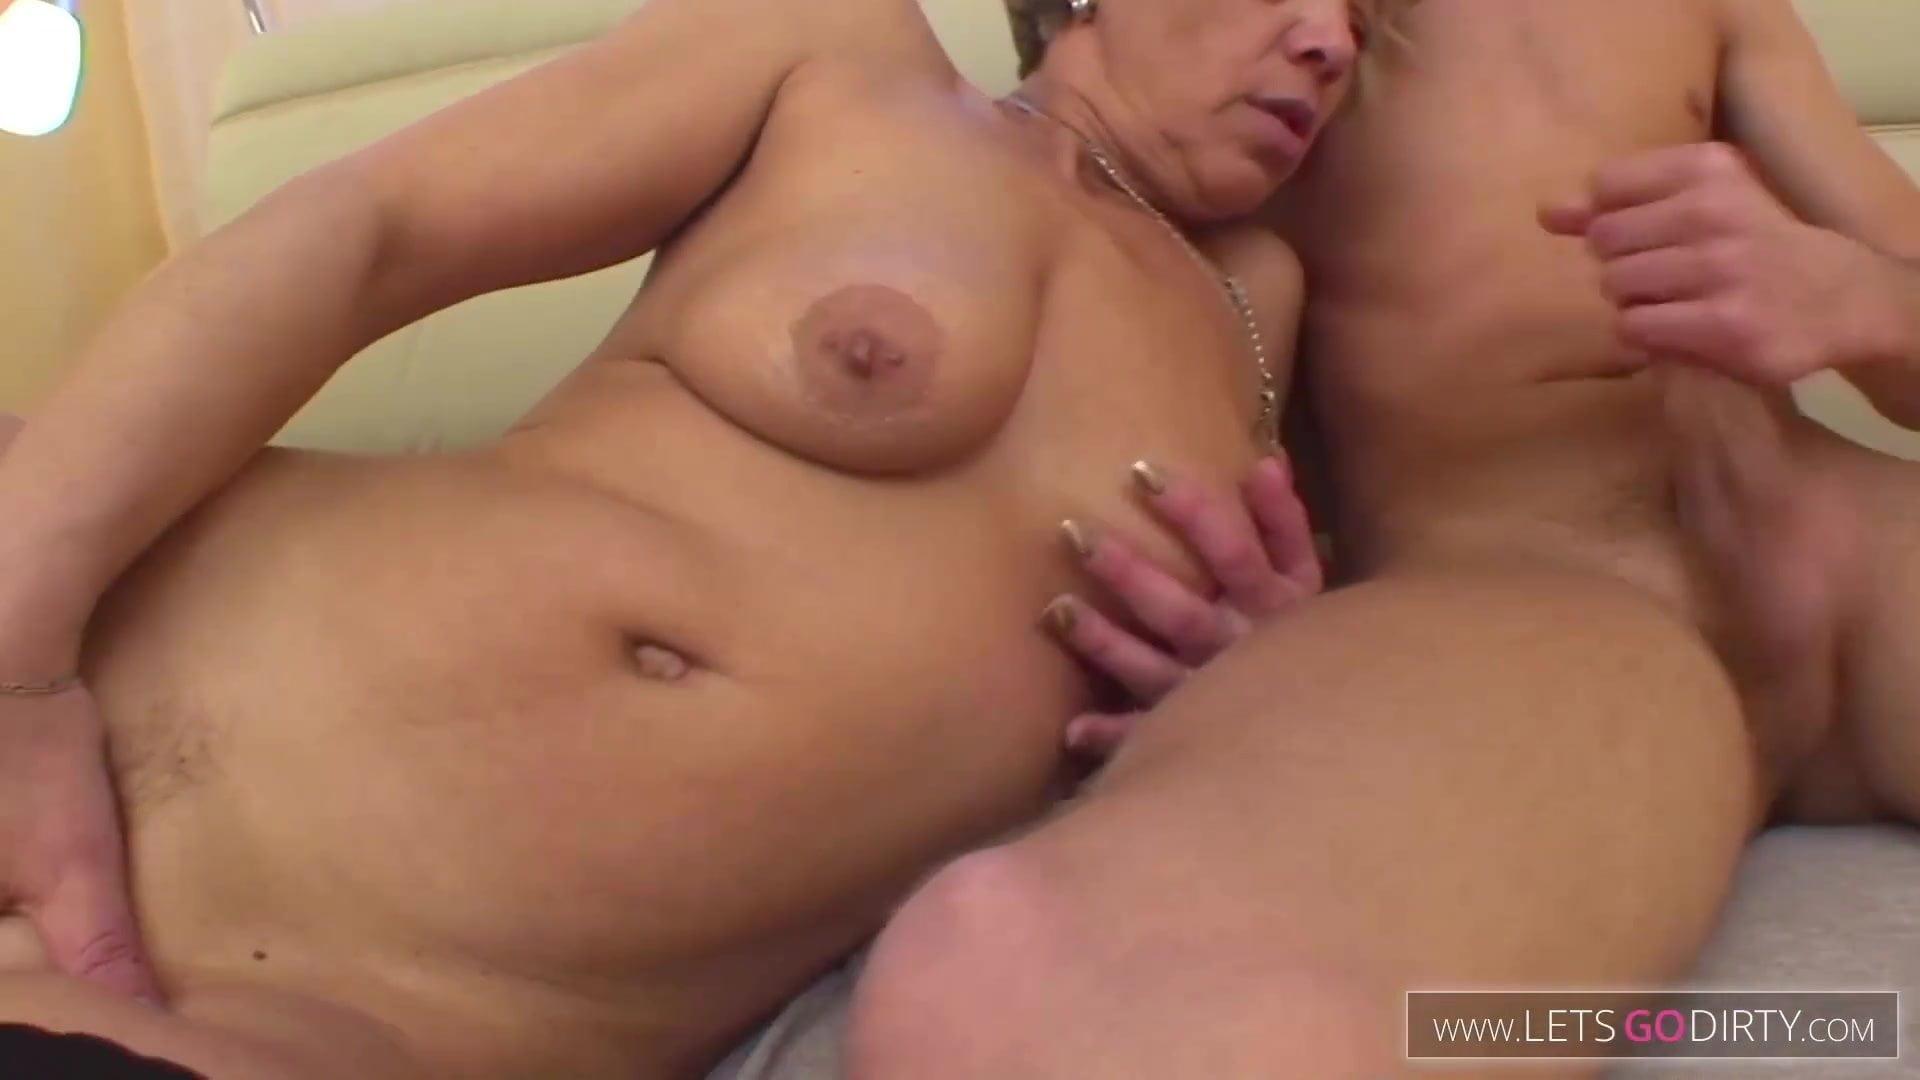 Free anal tube